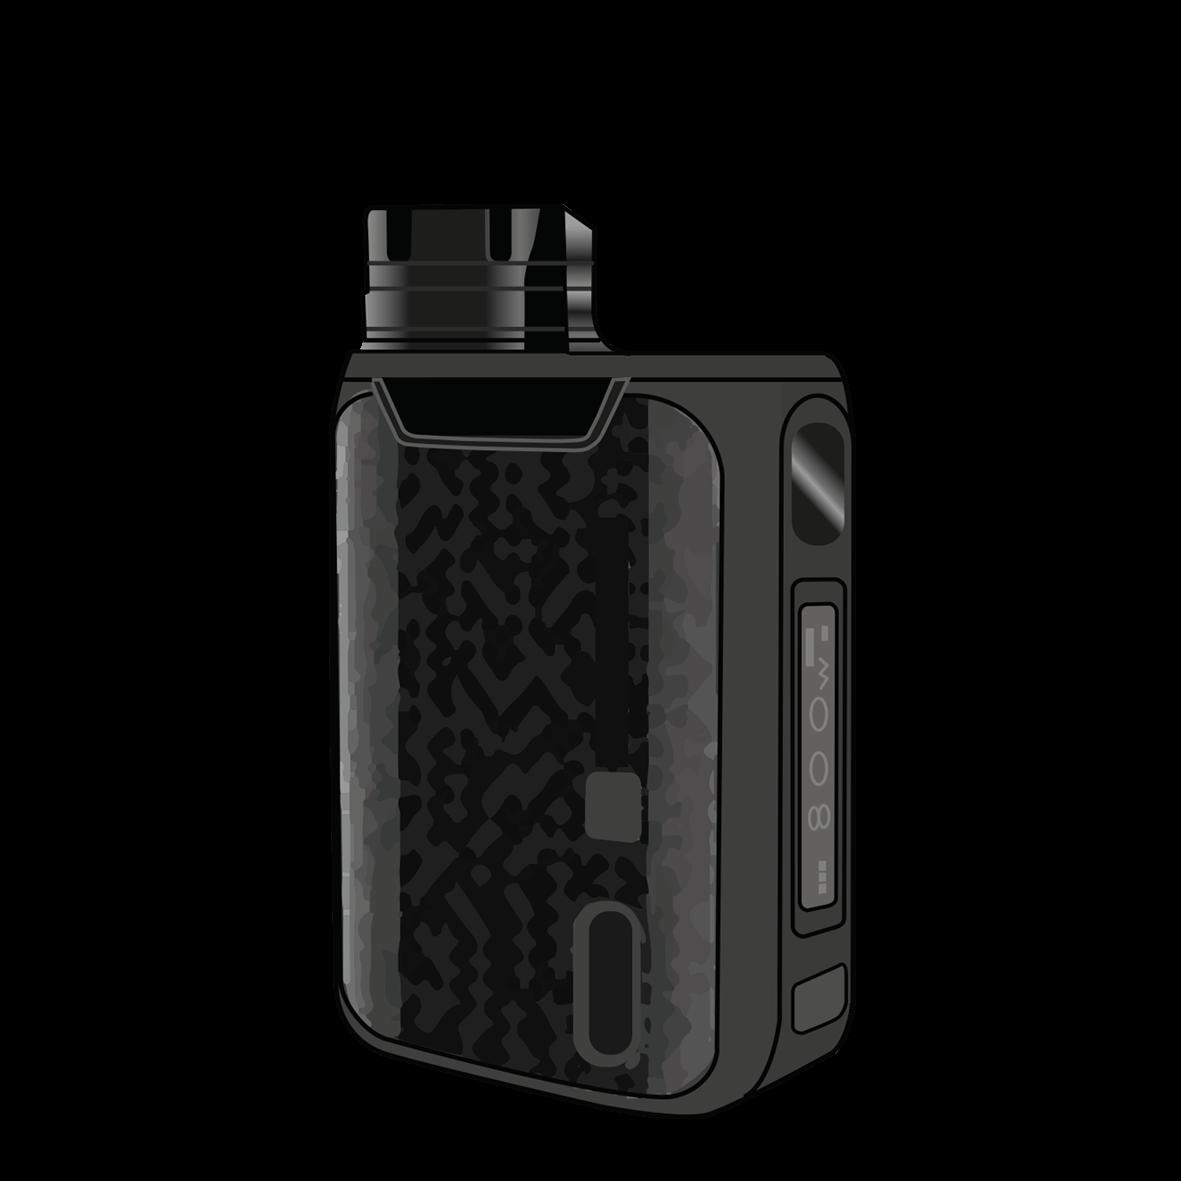 Mod 1 battery